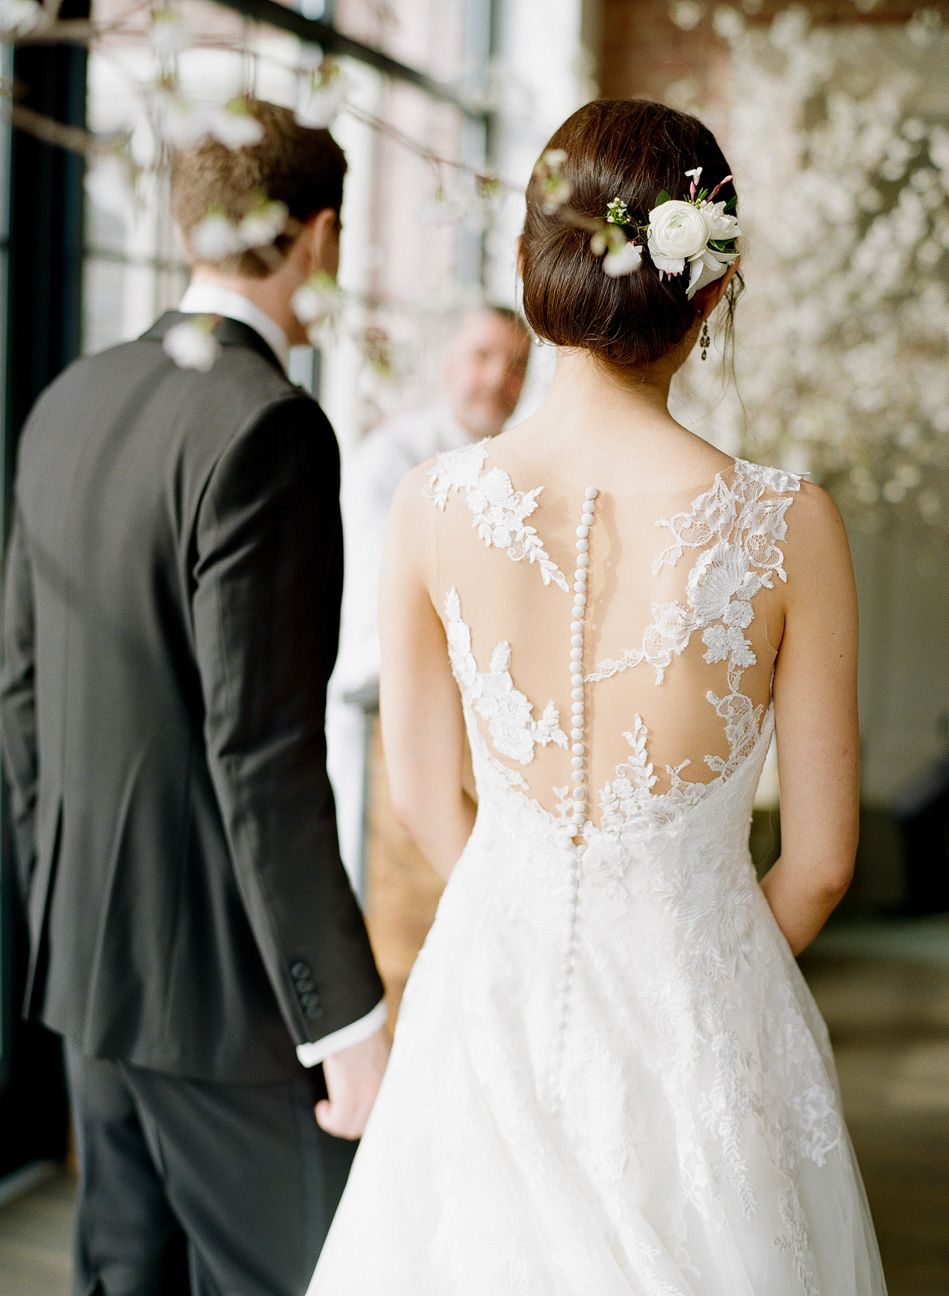 KarenHillPhotography-Zhu-Wedding-0460.jpg